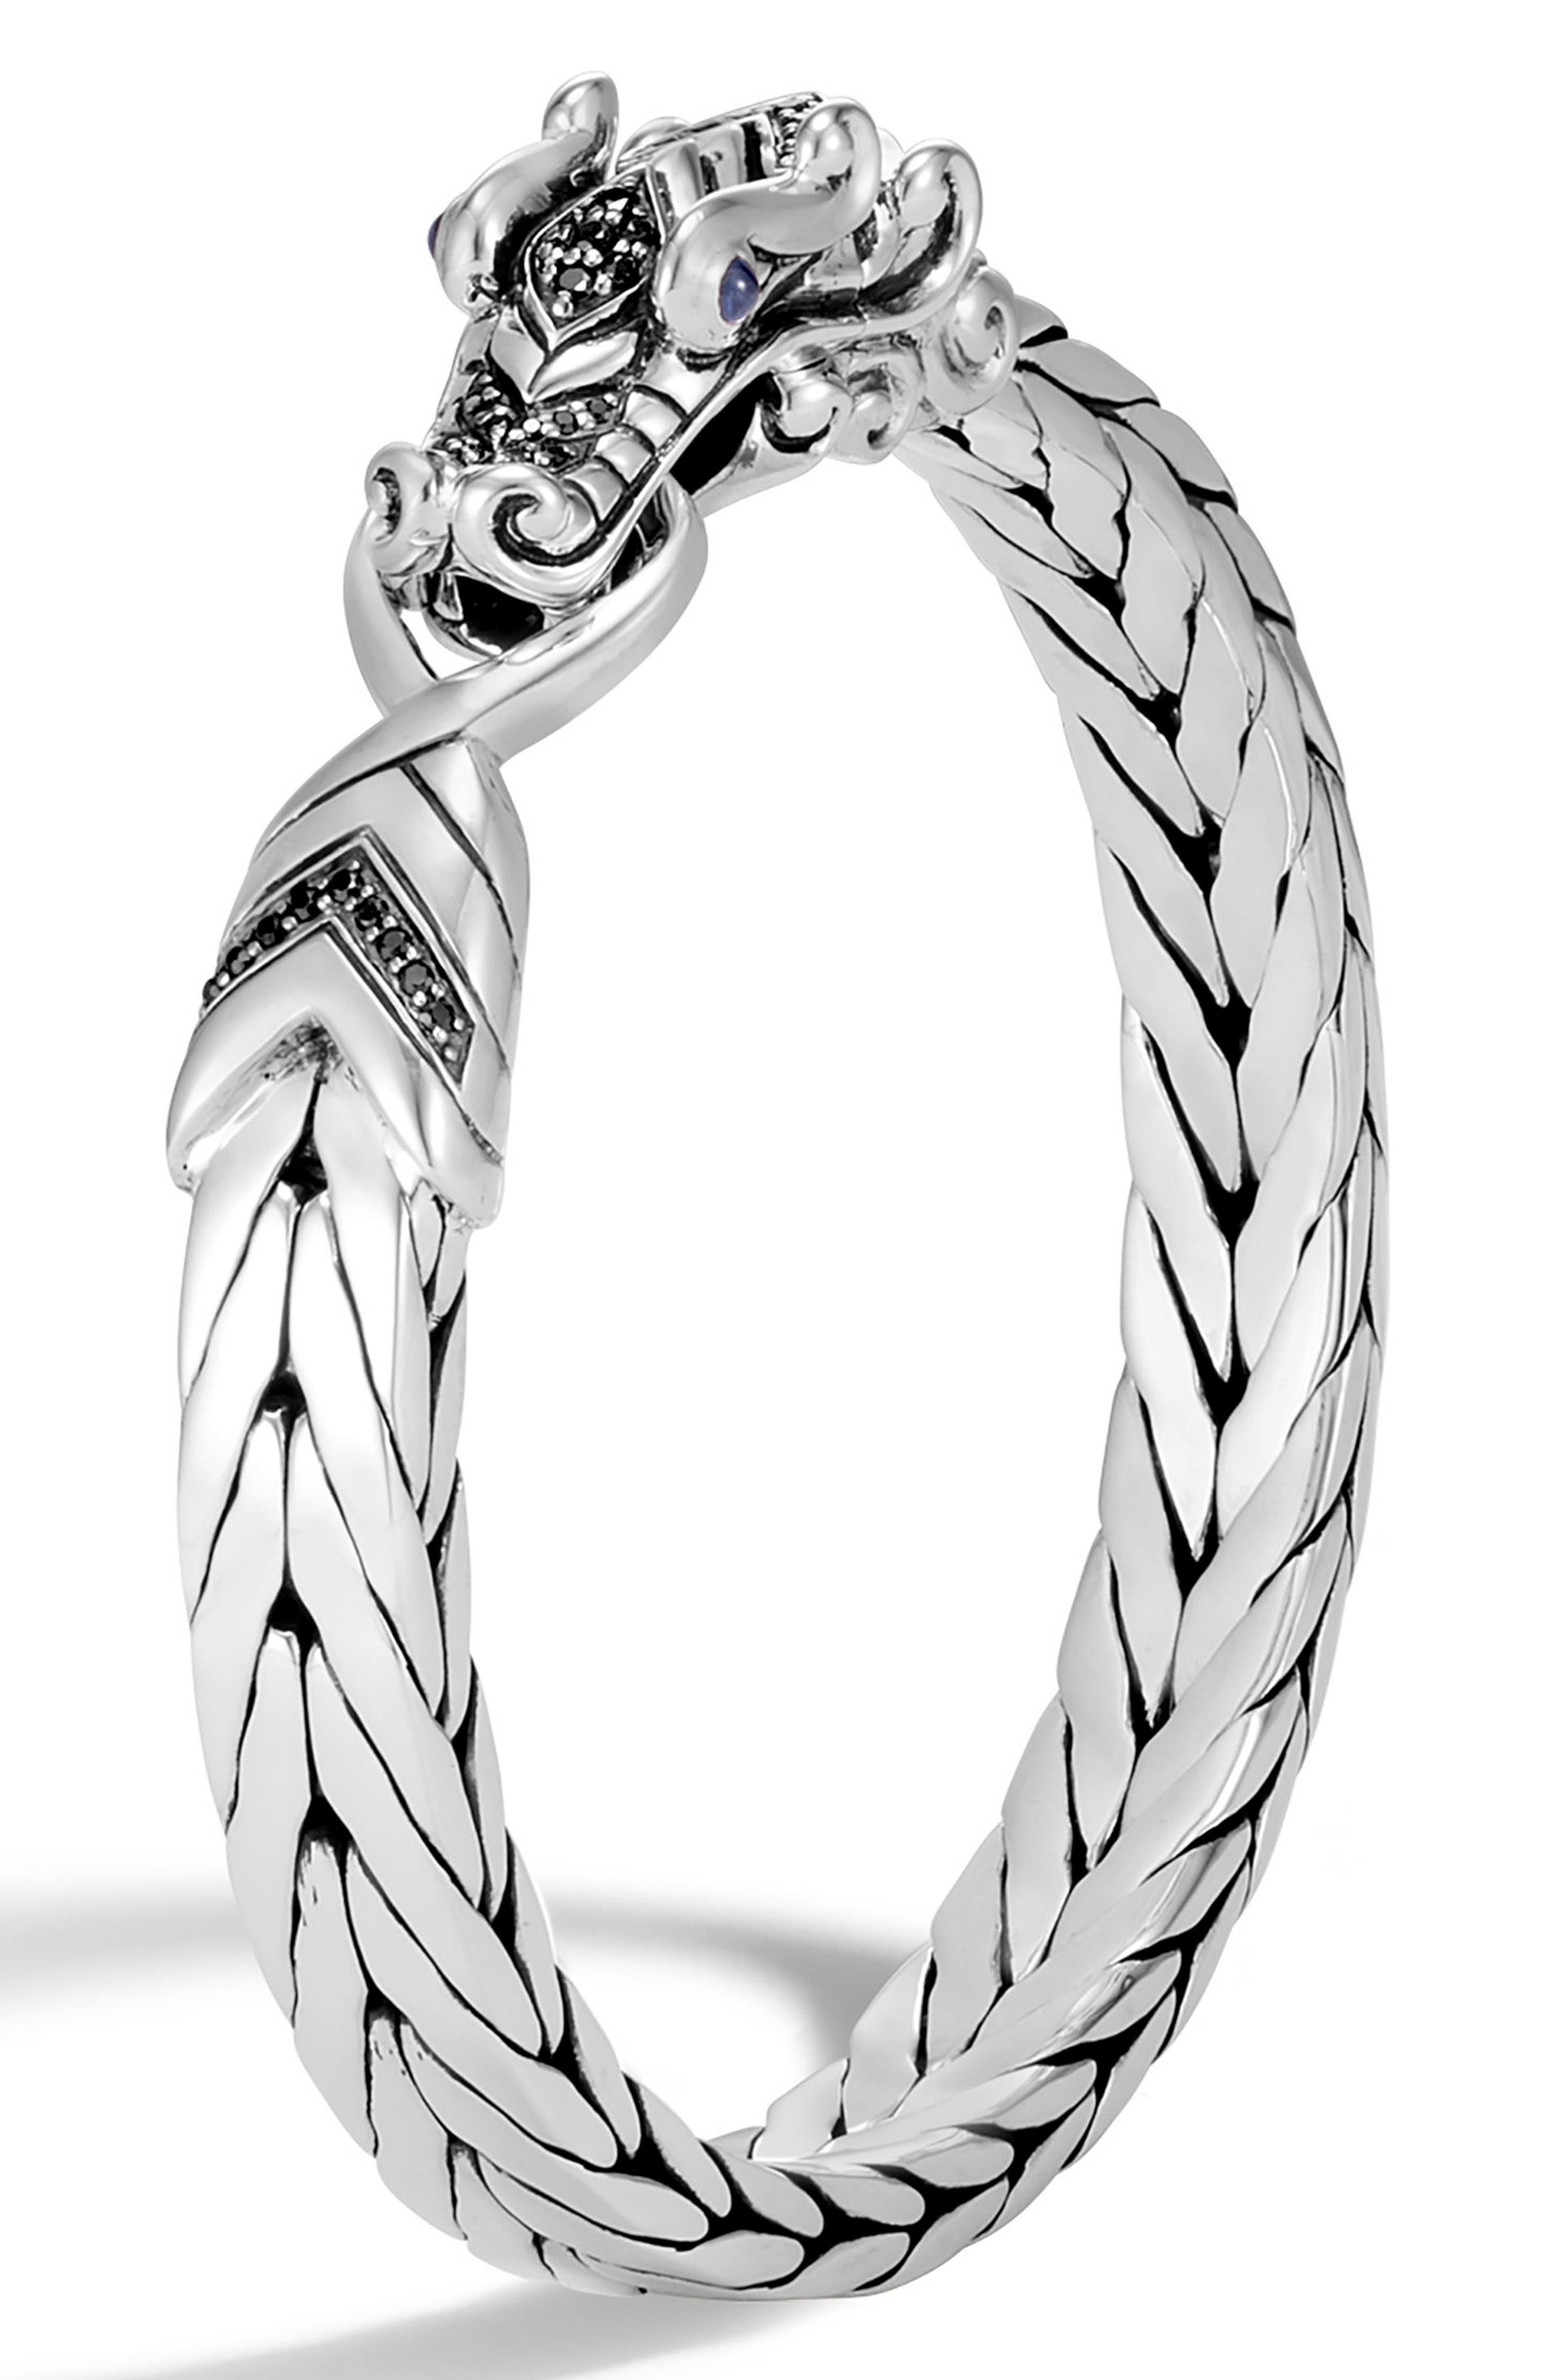 Men's Legends Naga Bracelet,                         Main,                         color, SILVER/ BLACK SAPPHIRE BLACK